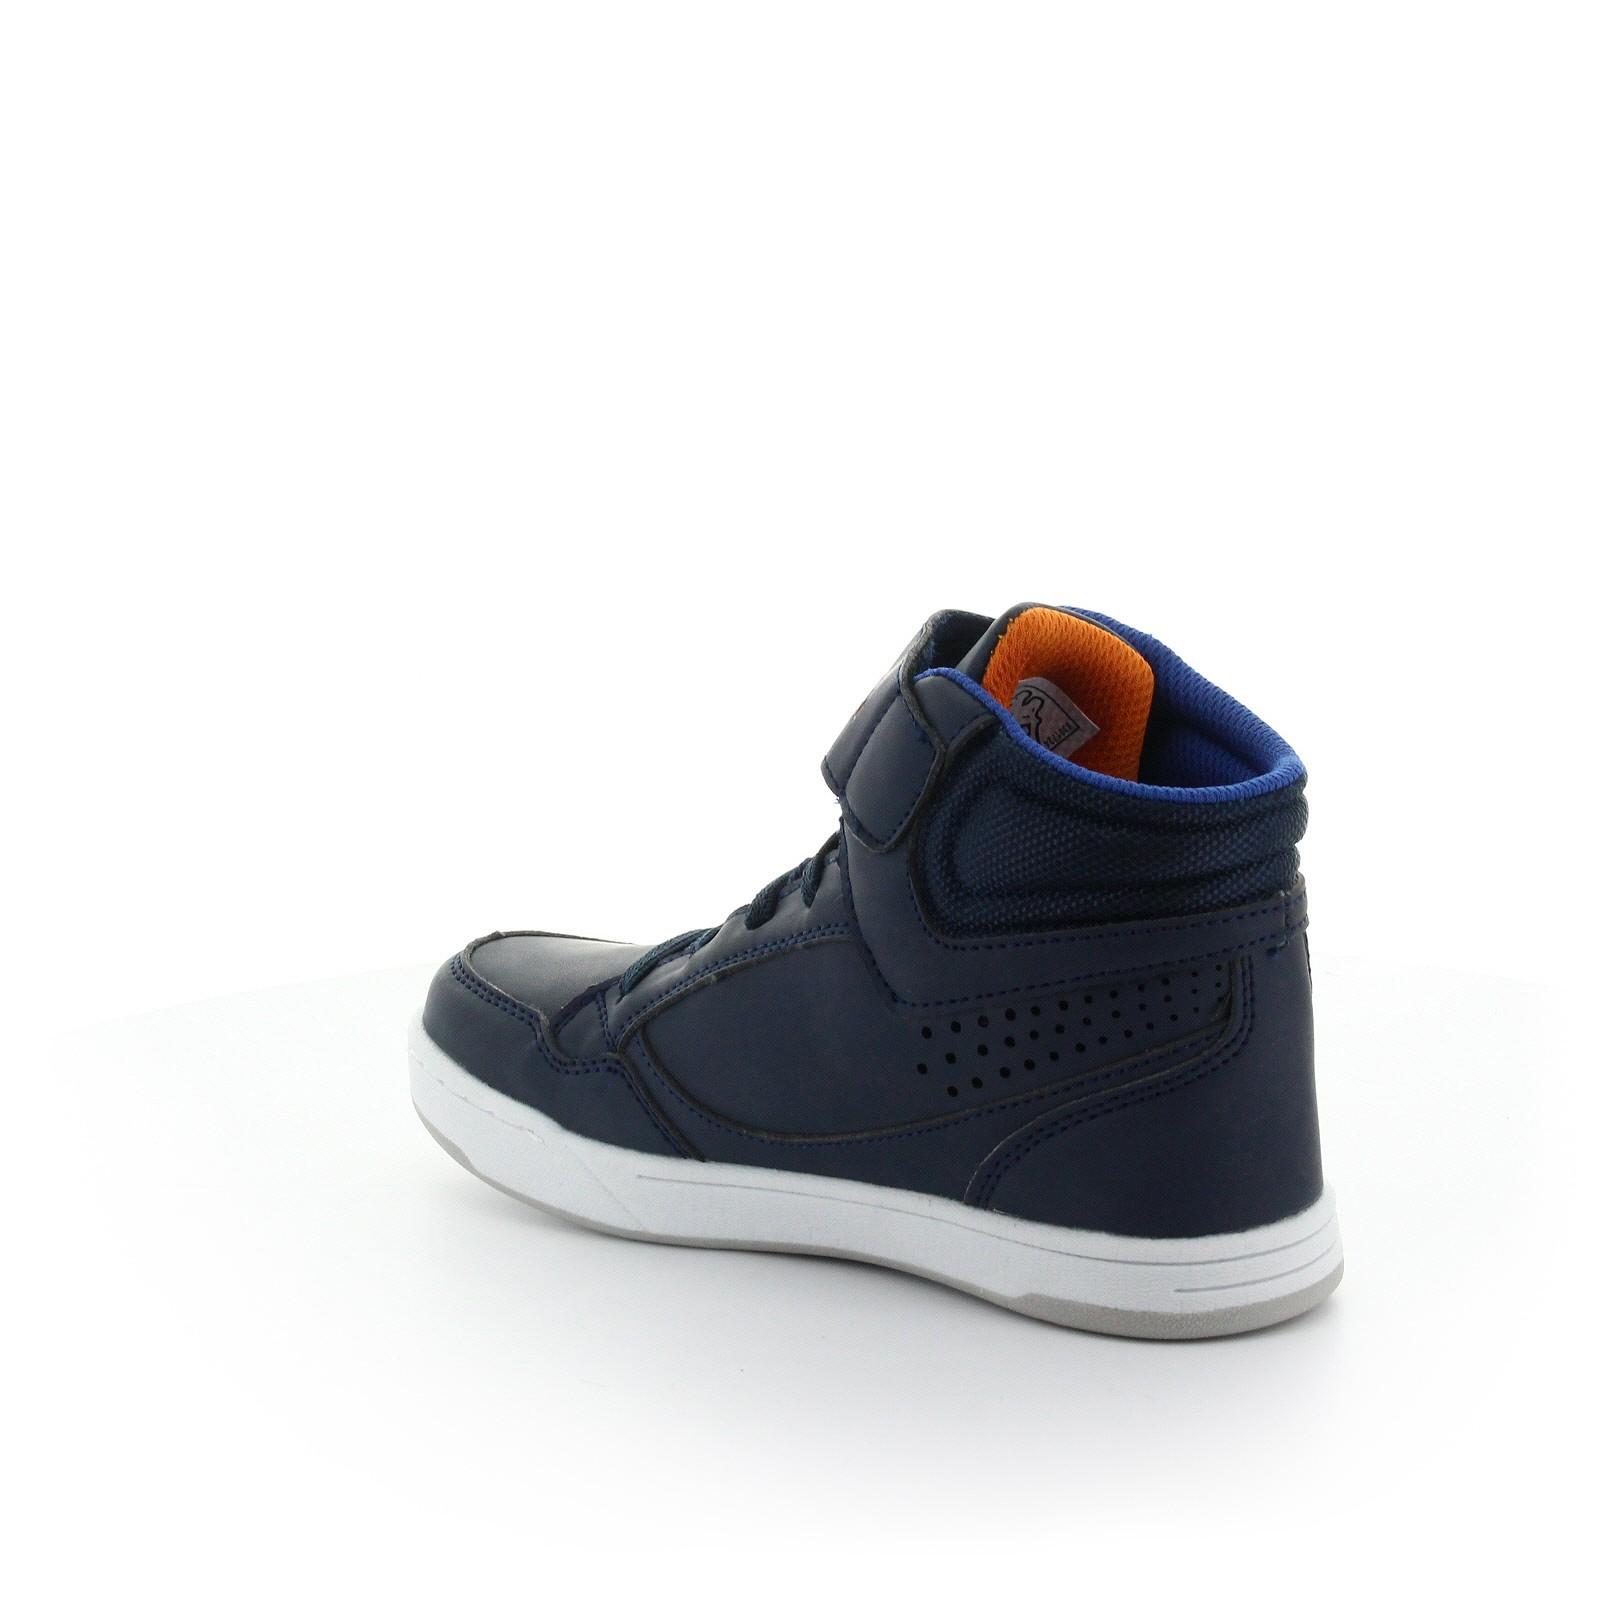 sneakers mid Kappa forward mid k - Маратонки - Обувки - Деца   TEMPO ... a2fc96c4541c